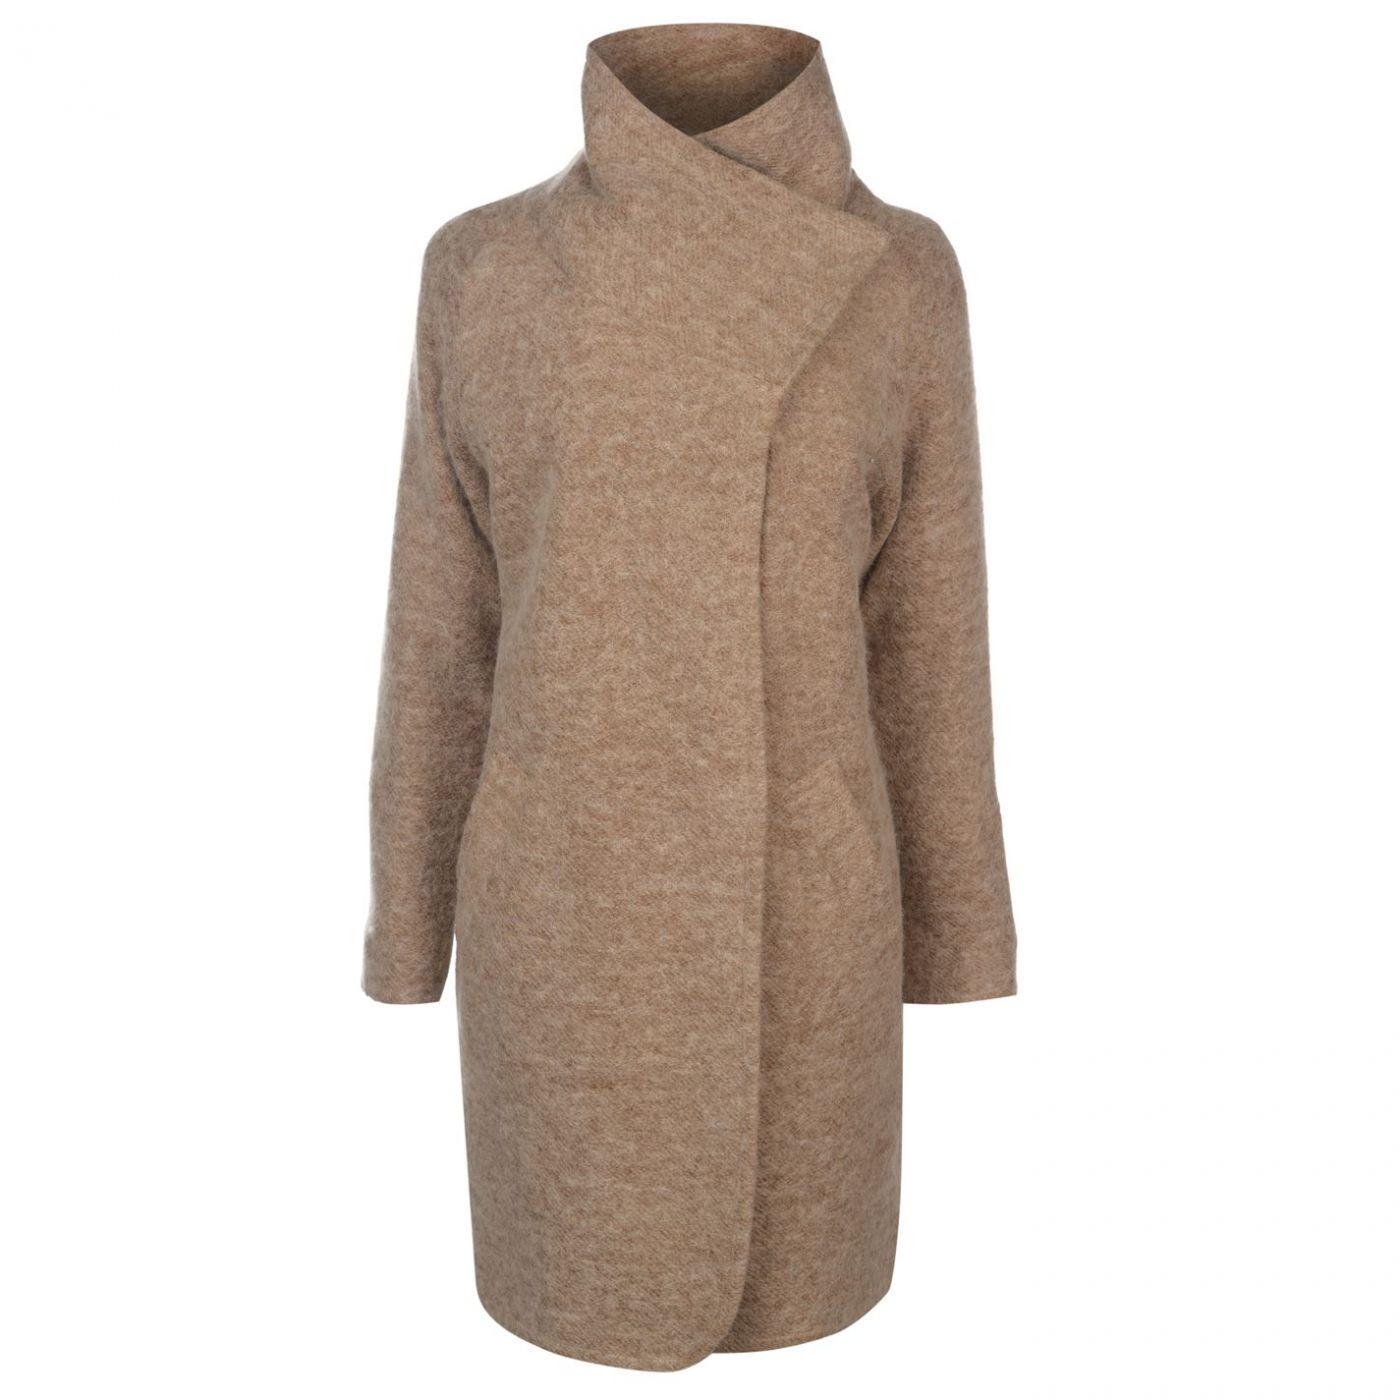 David Barry Wool Coat Ladies